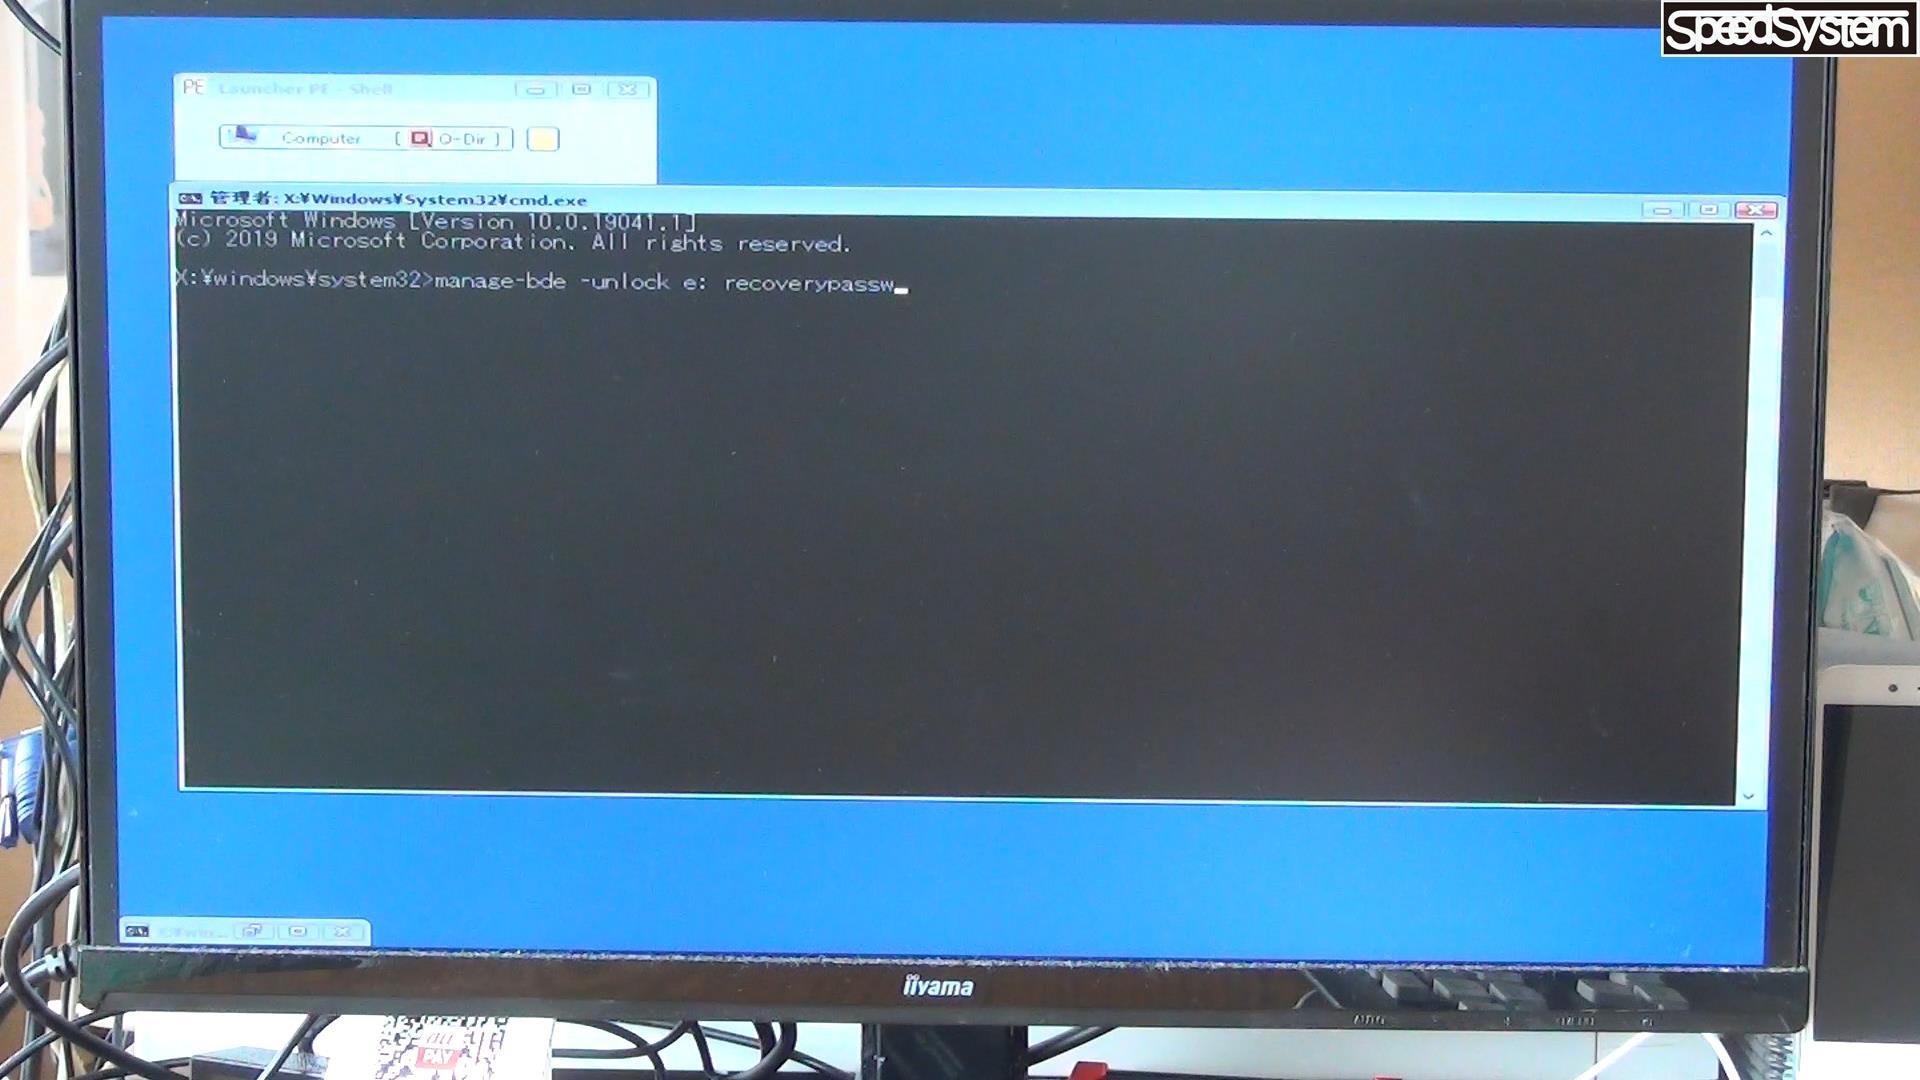 WinPeの使い方動画(BitLocker解除方法を含む)